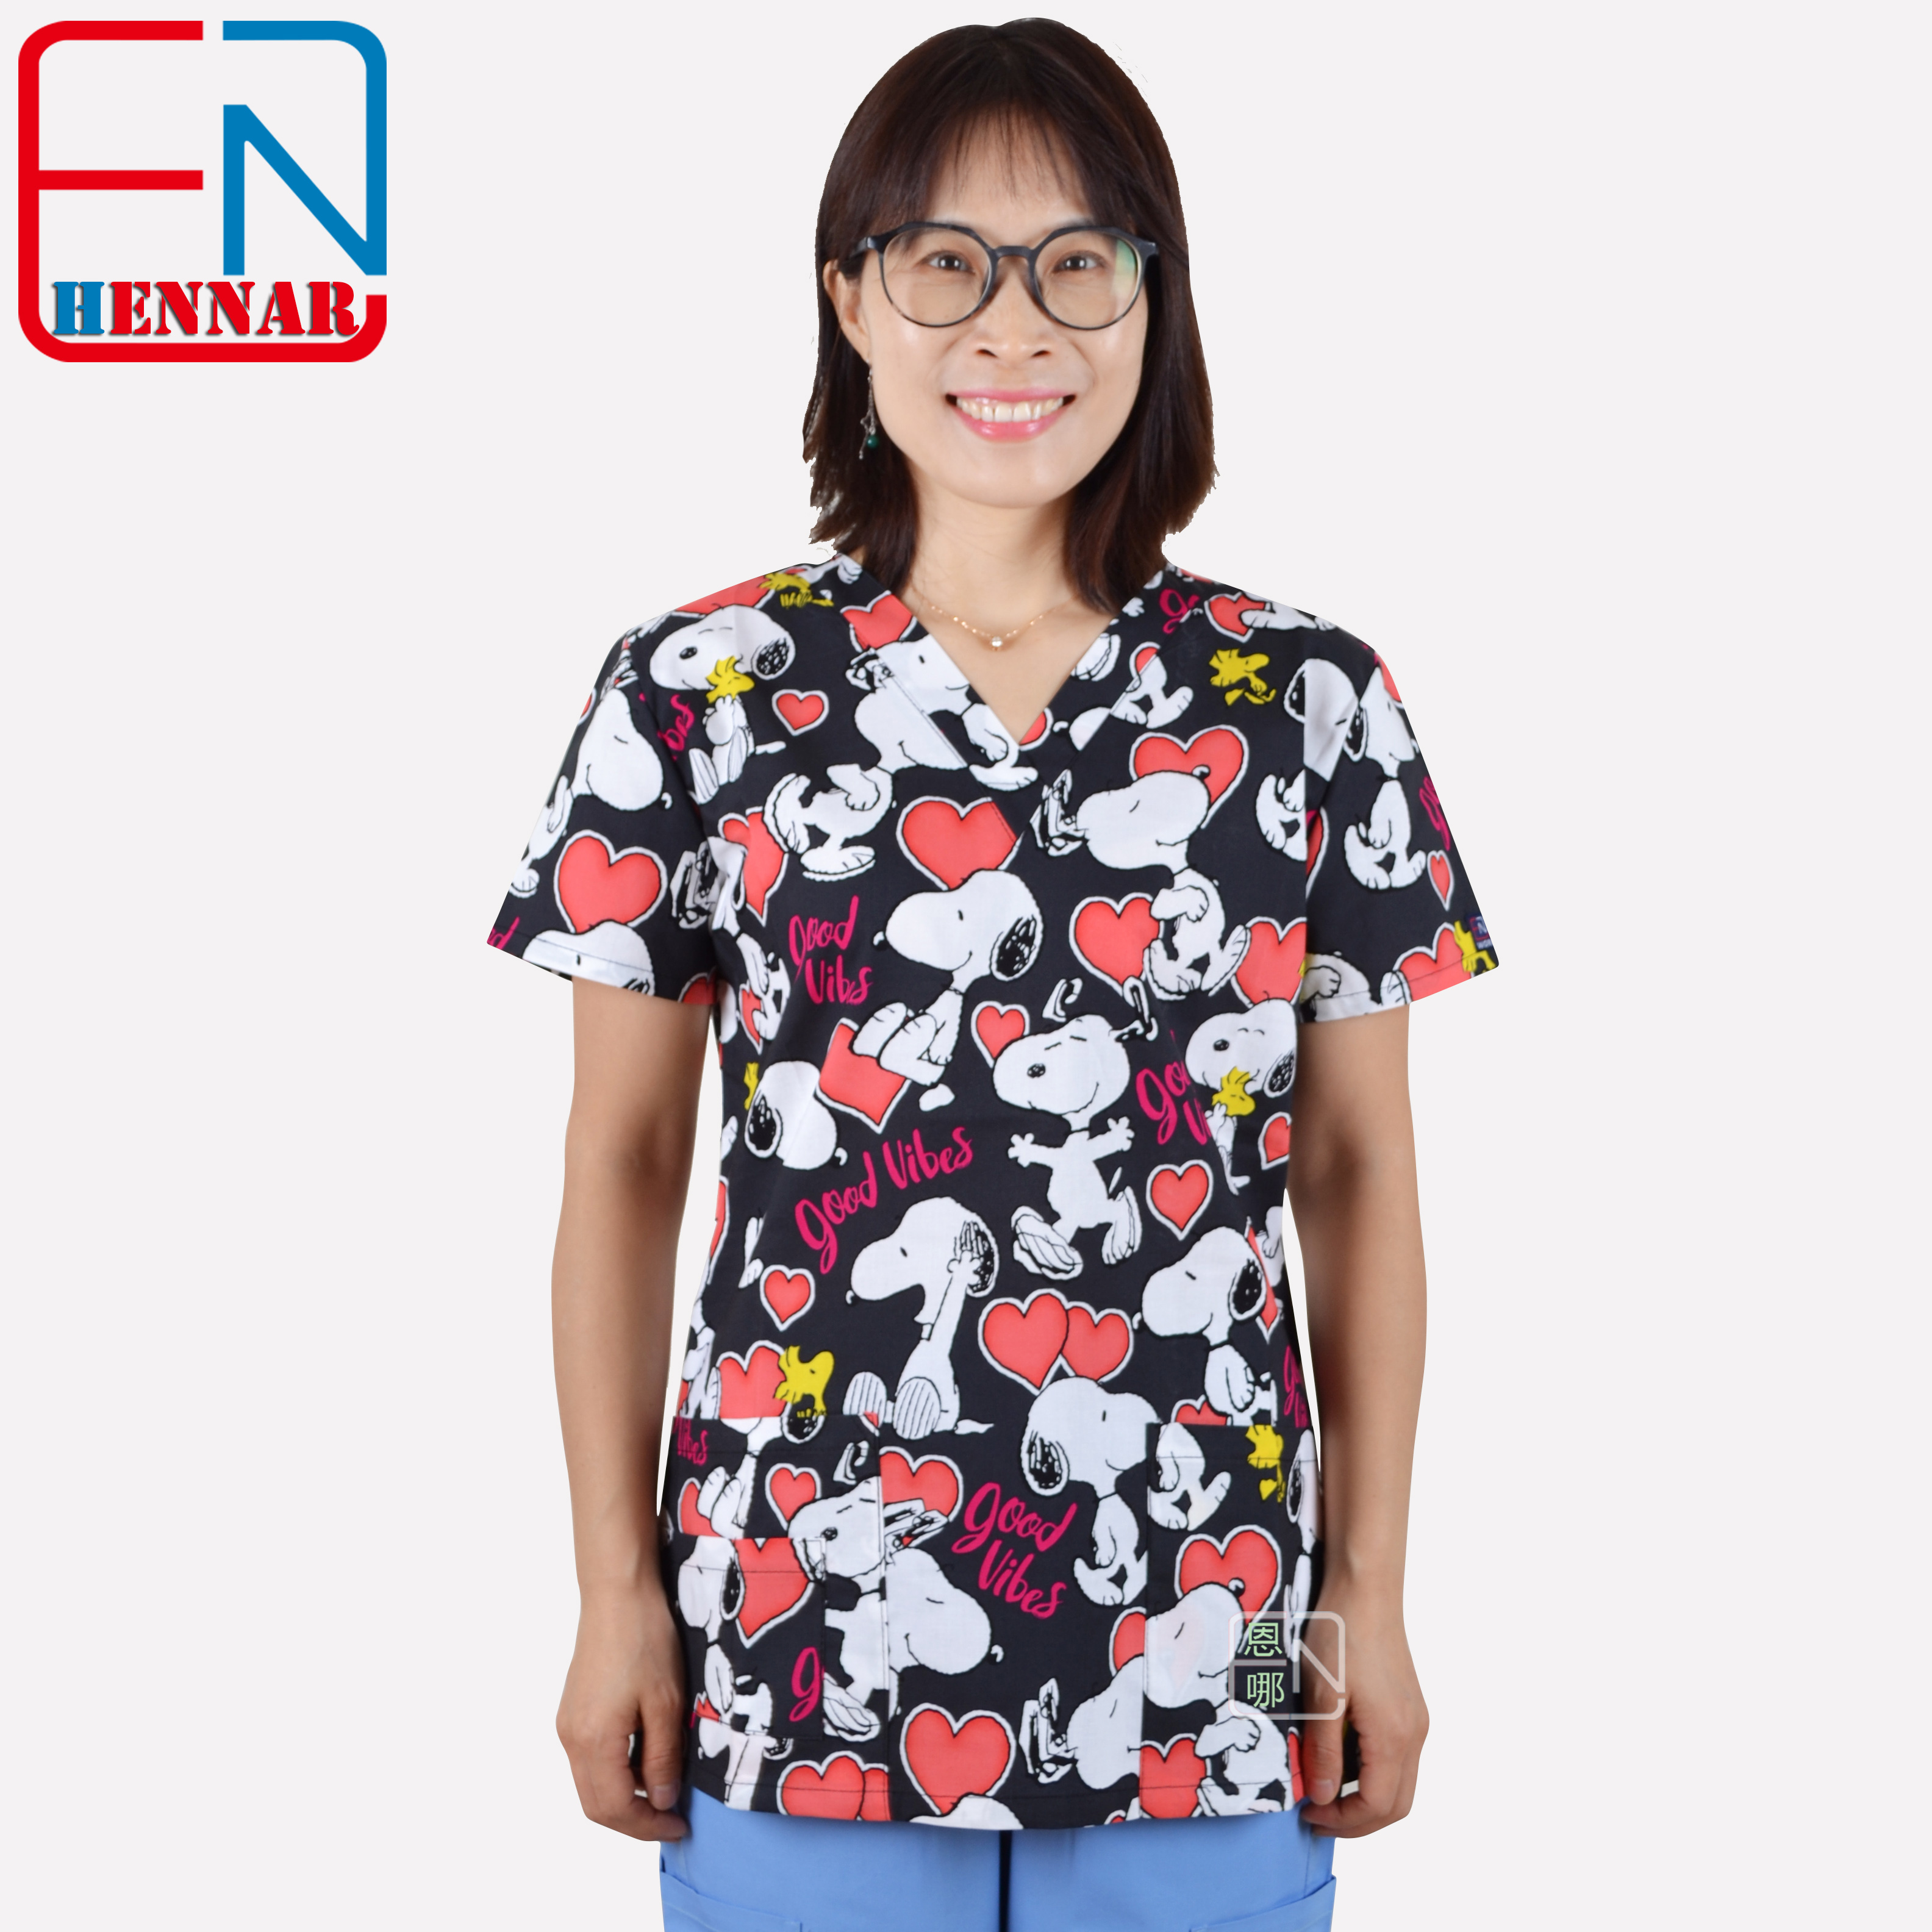 Hennar Medical Scrubs Nursing Scrubs Women Scrubs Nurse Medical Uniformes Dentist Uniform In 100% Cotton Dentist Scrub Top